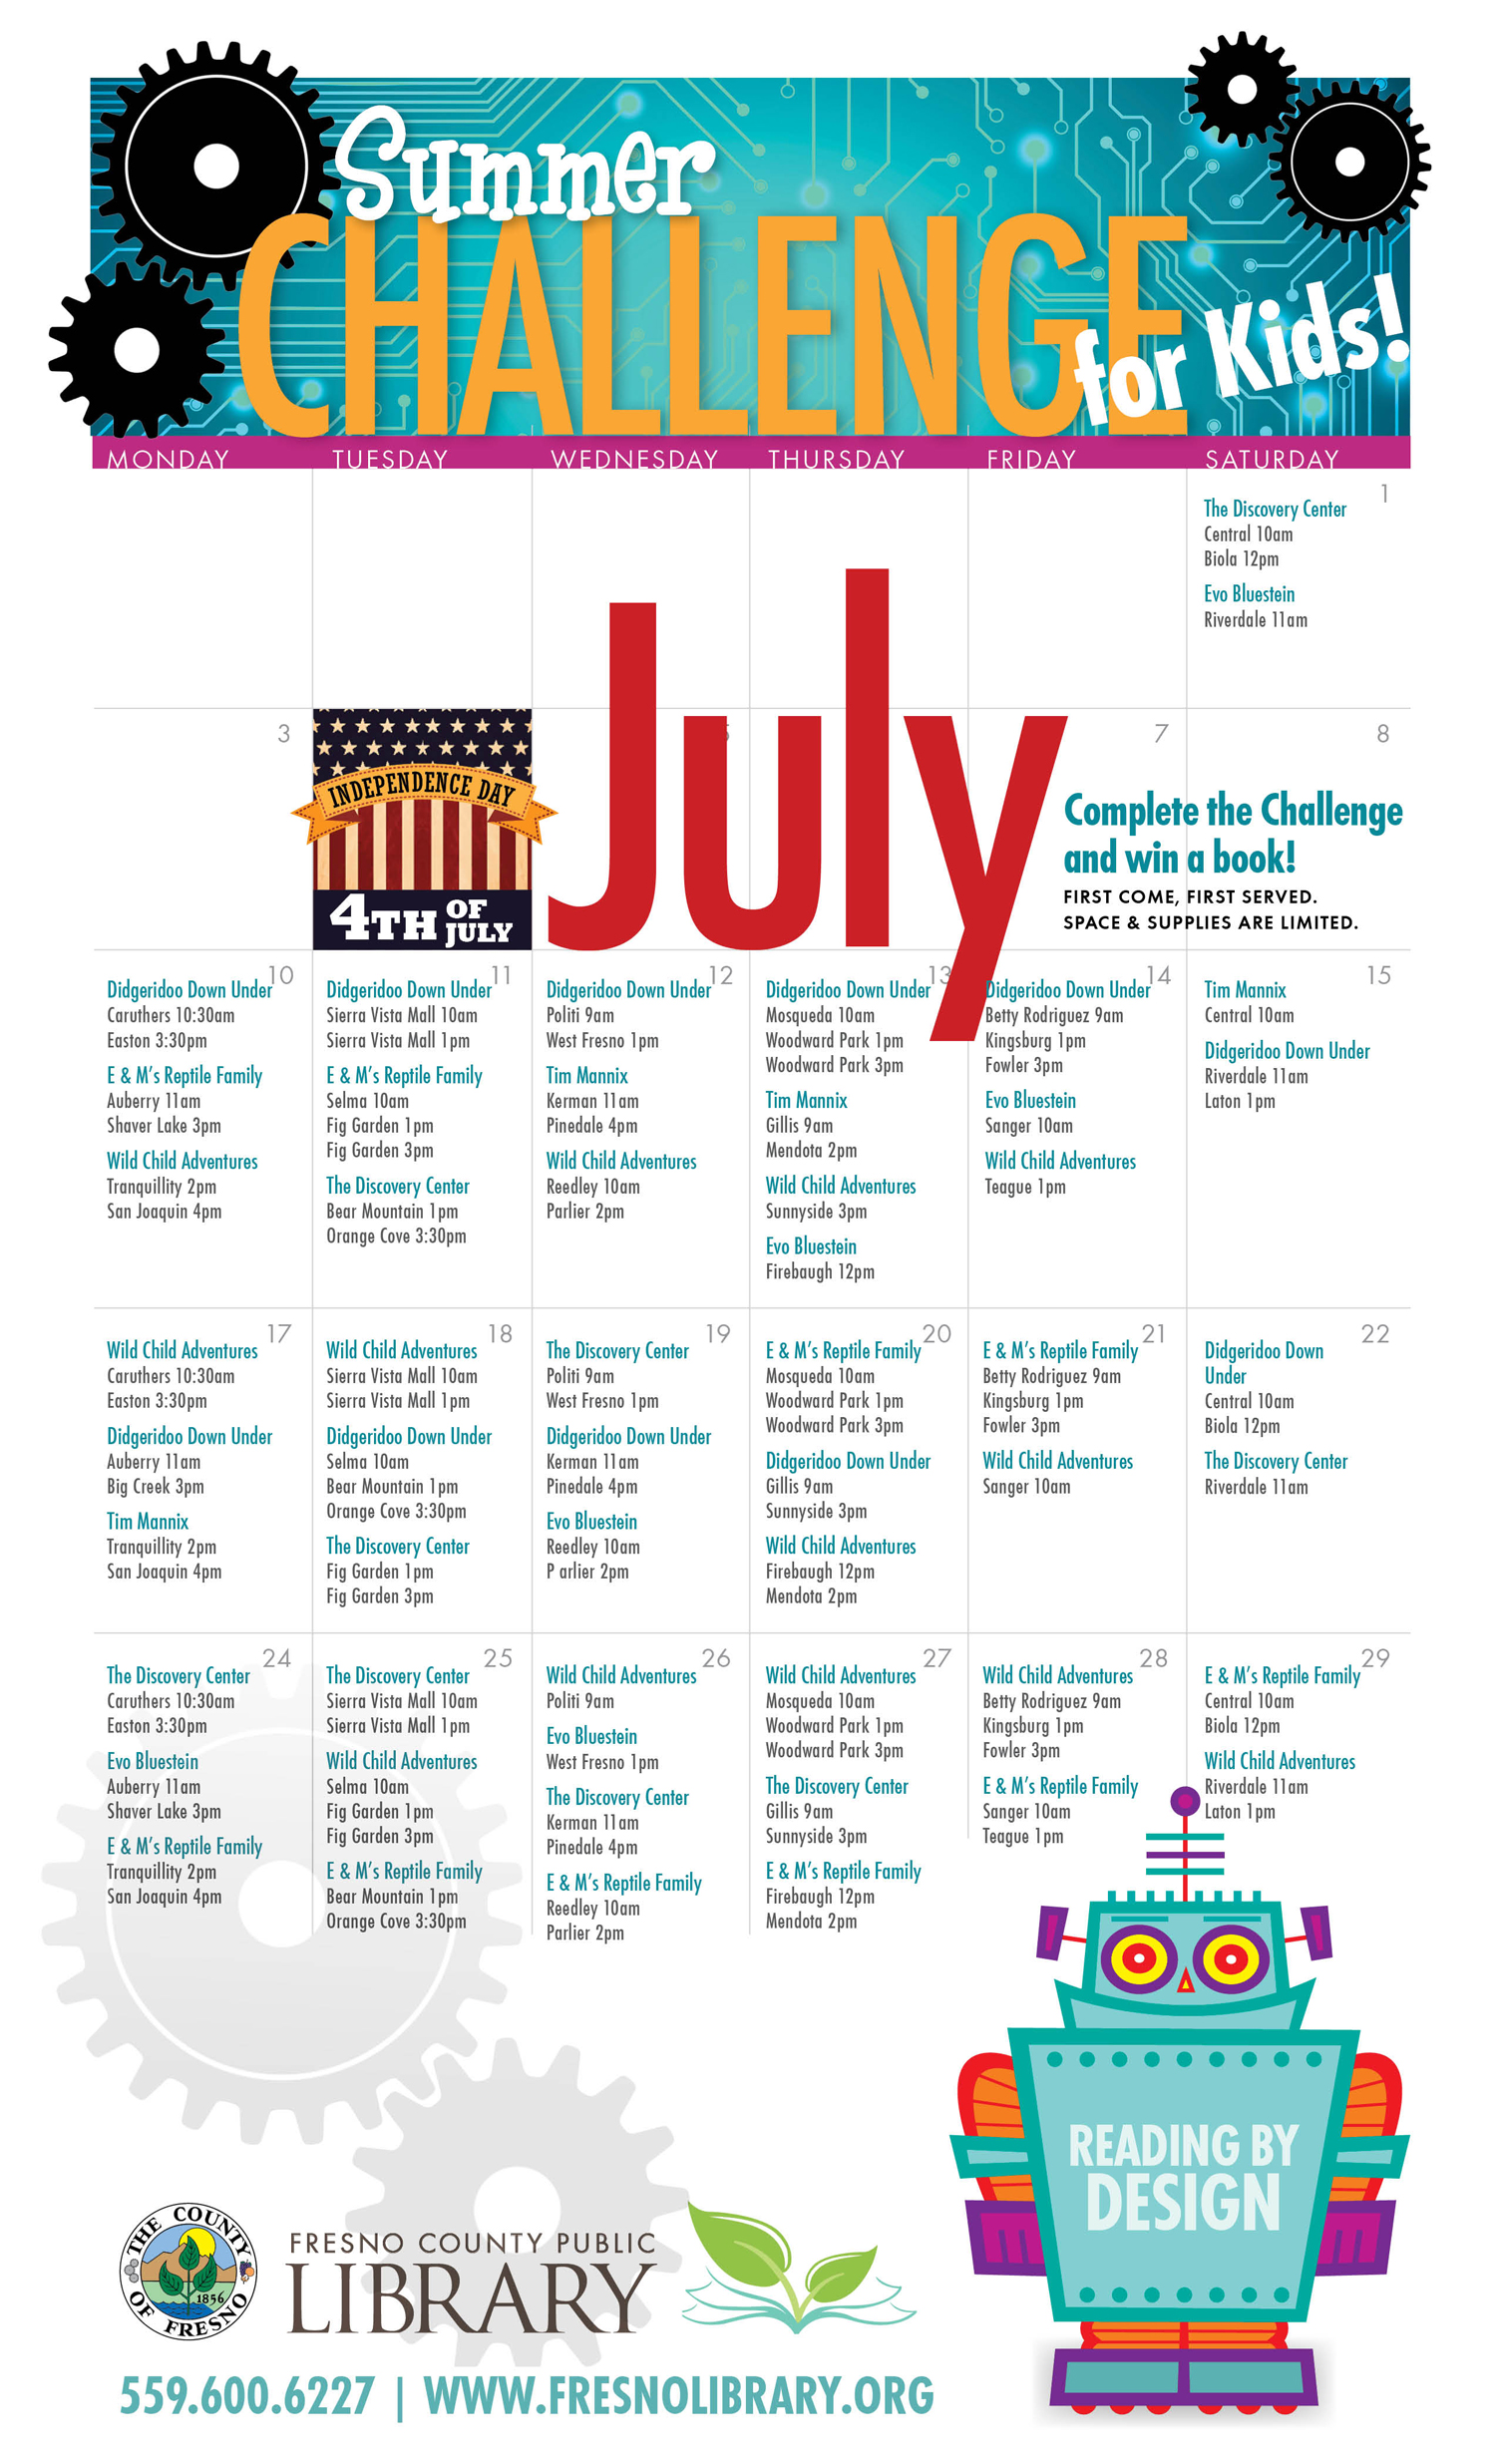 Summer-Challenge-Calendar-KIDS-20172-july